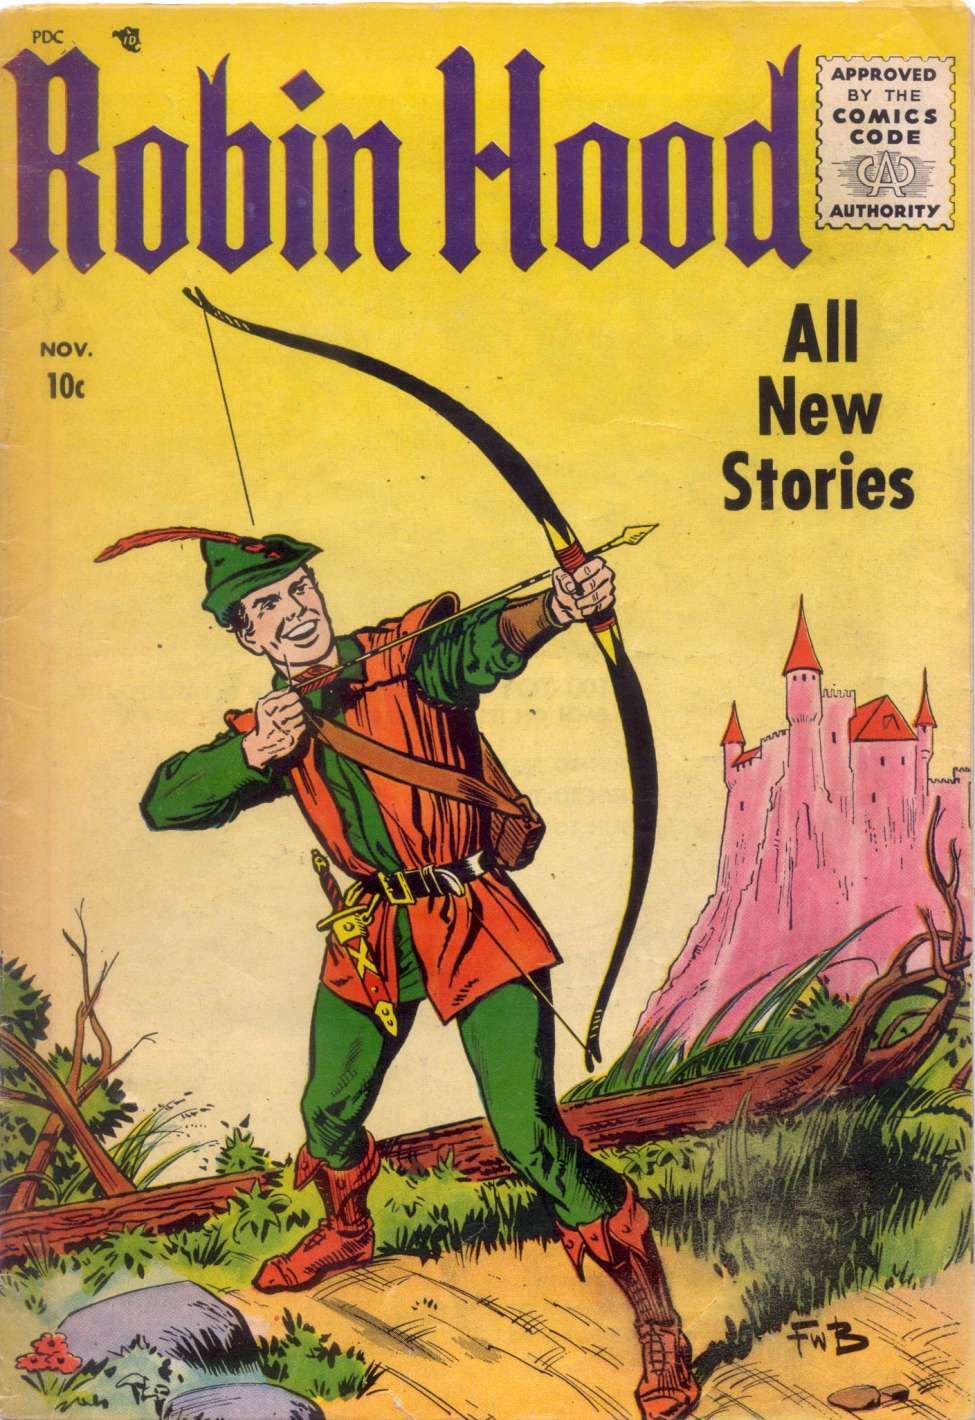 Comic Robin Hood Buscar Con Google Historietas Famosas De A 241 Os 50 Y 60 Historietas Libros